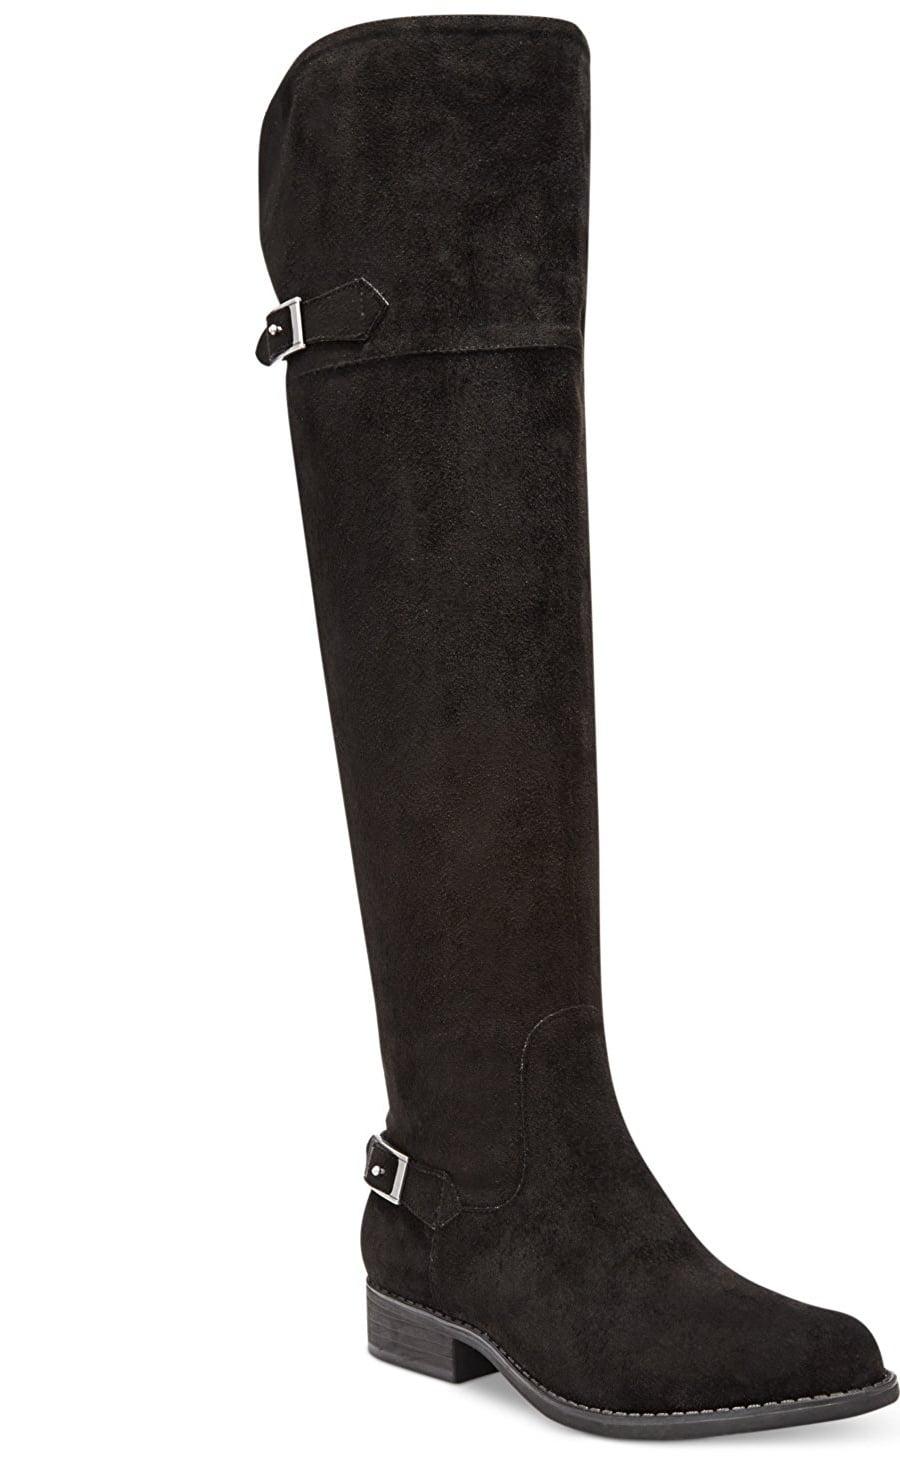 American Rag Womens Ada Closed Toe Knee High Fashion Boots, Black, Size 10.0